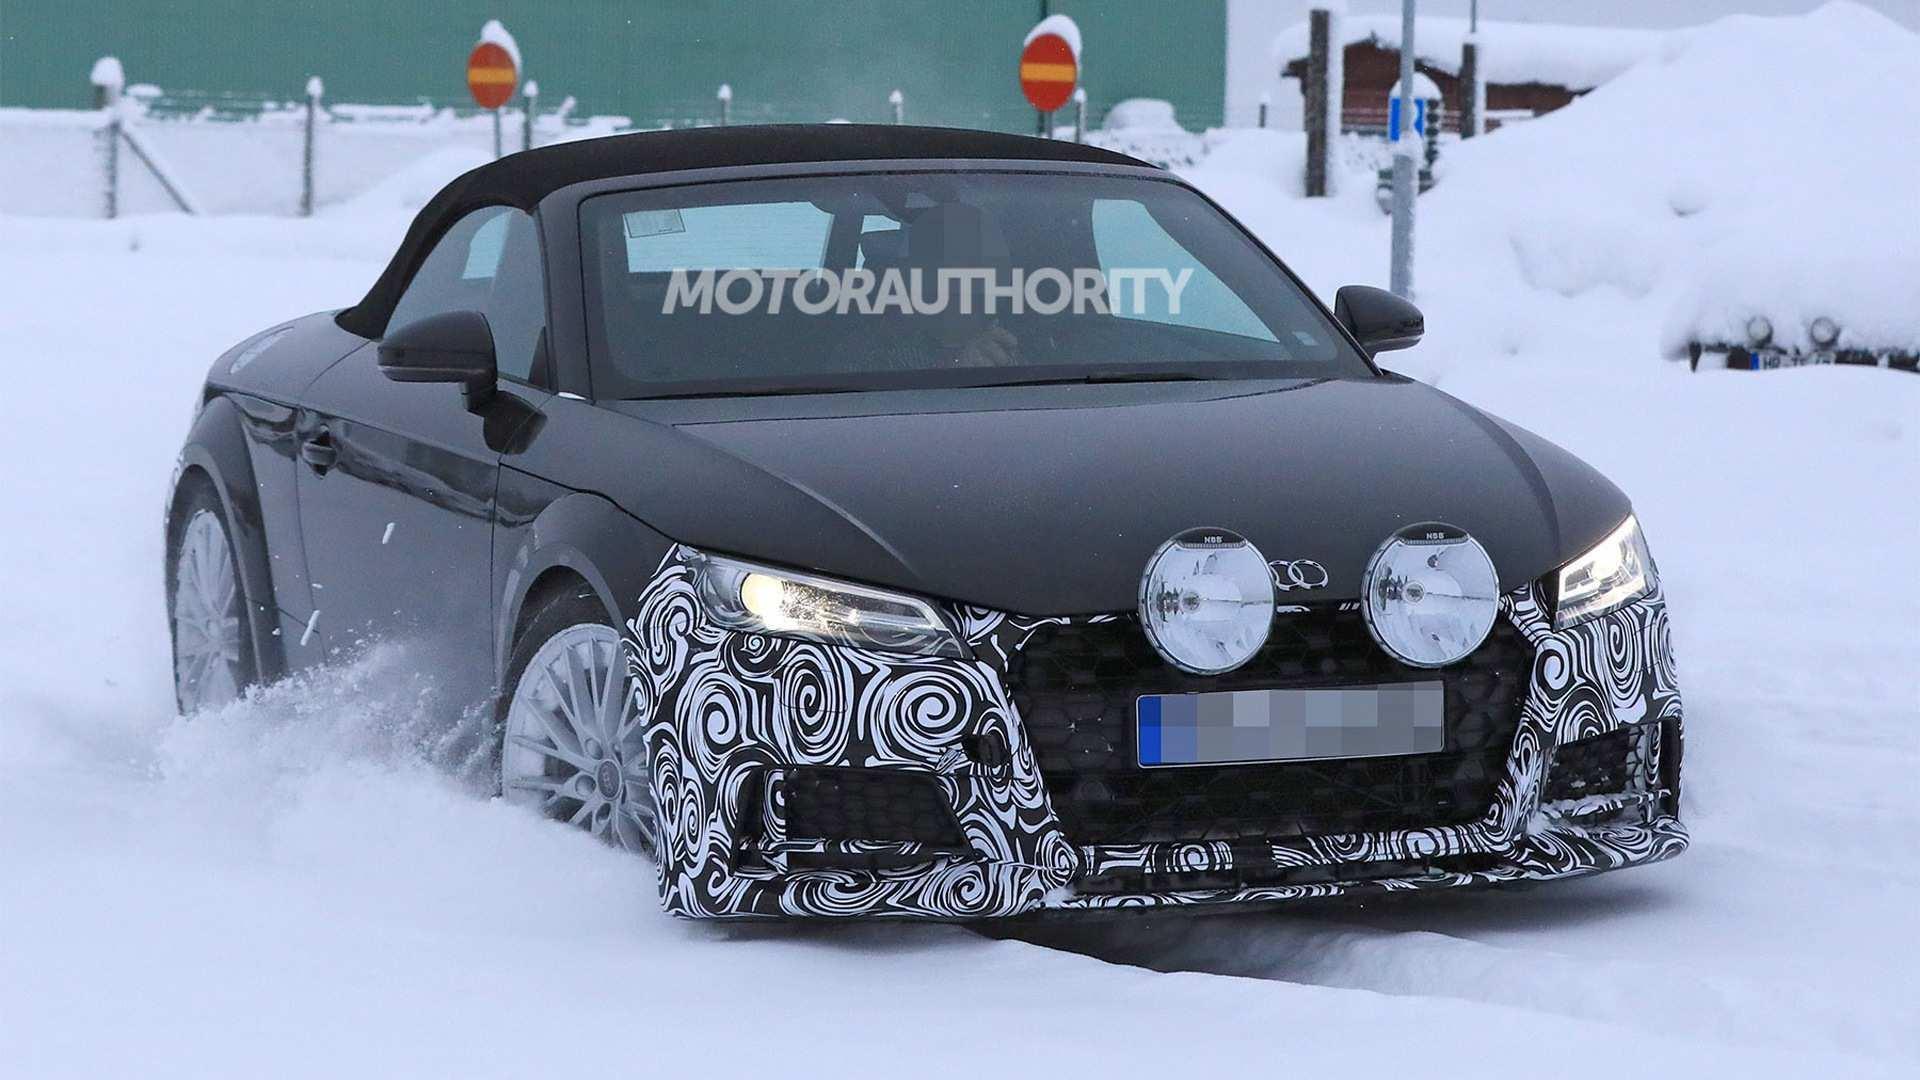 36 Great Audi Tt Convertible 2020 Exterior and Interior with Audi Tt Convertible 2020